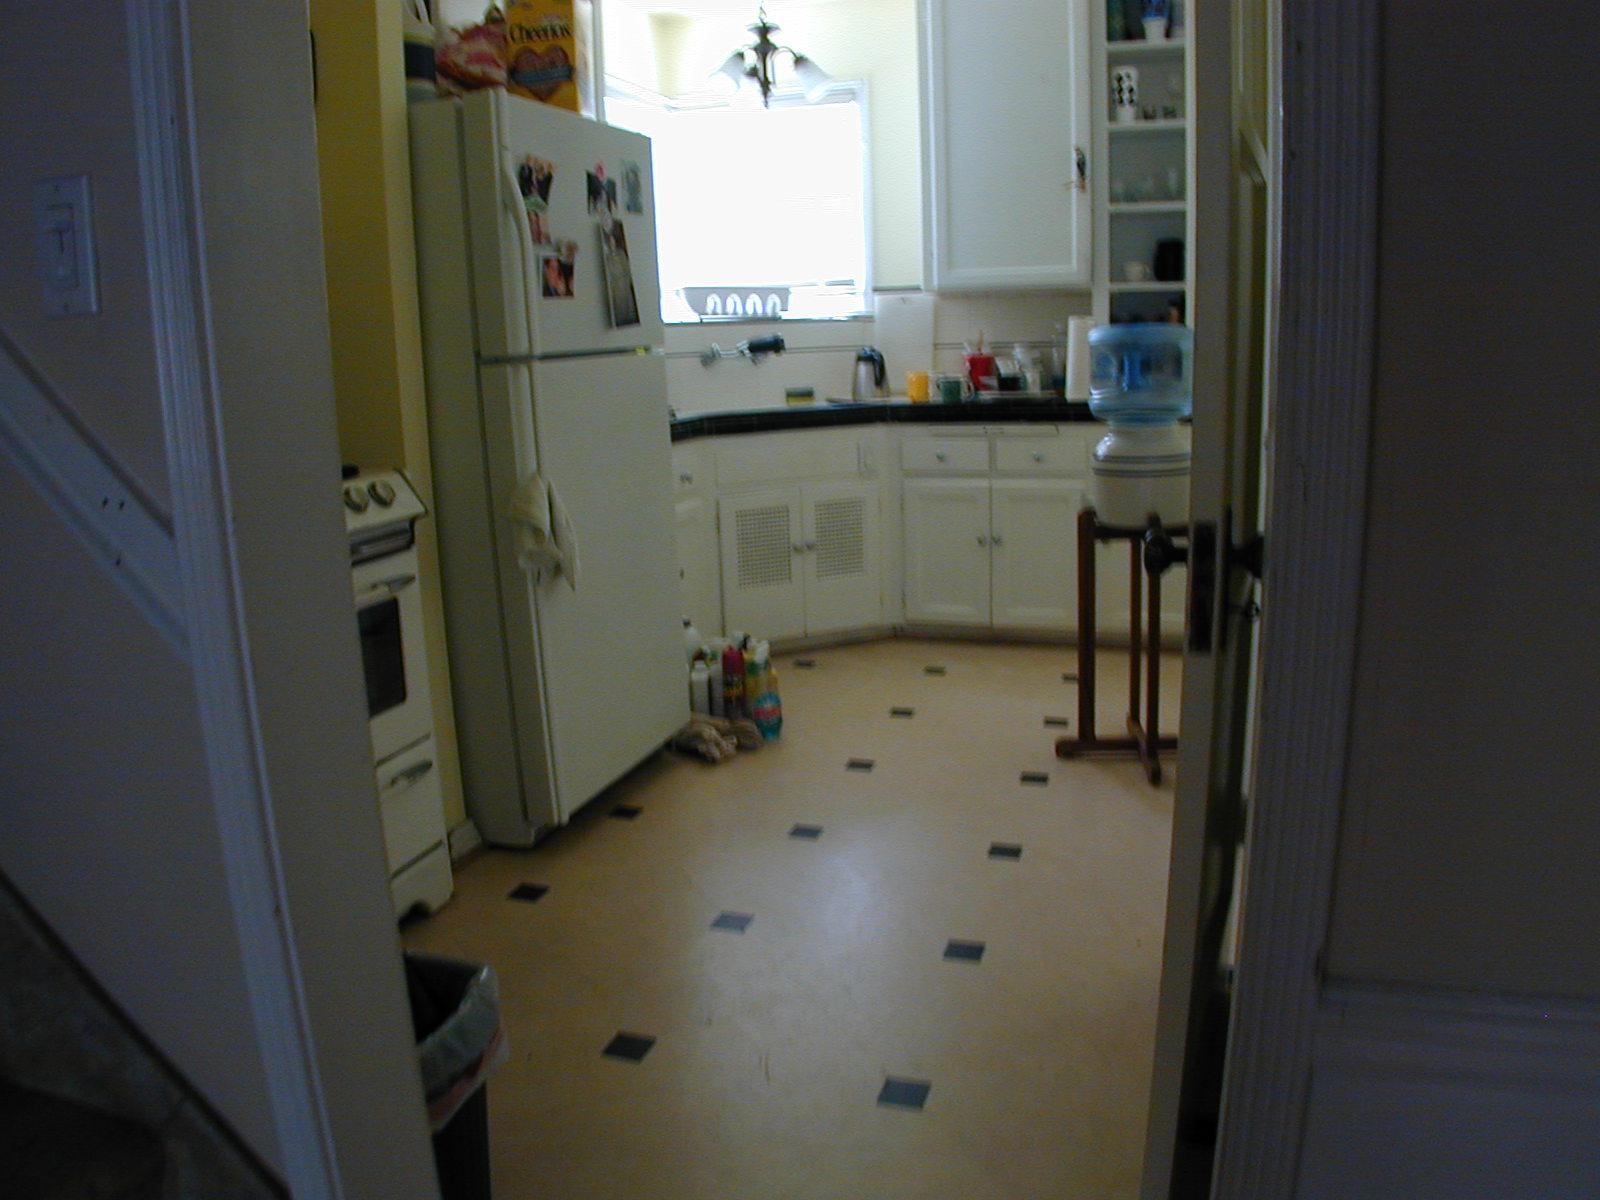 similar kitchen, not identical